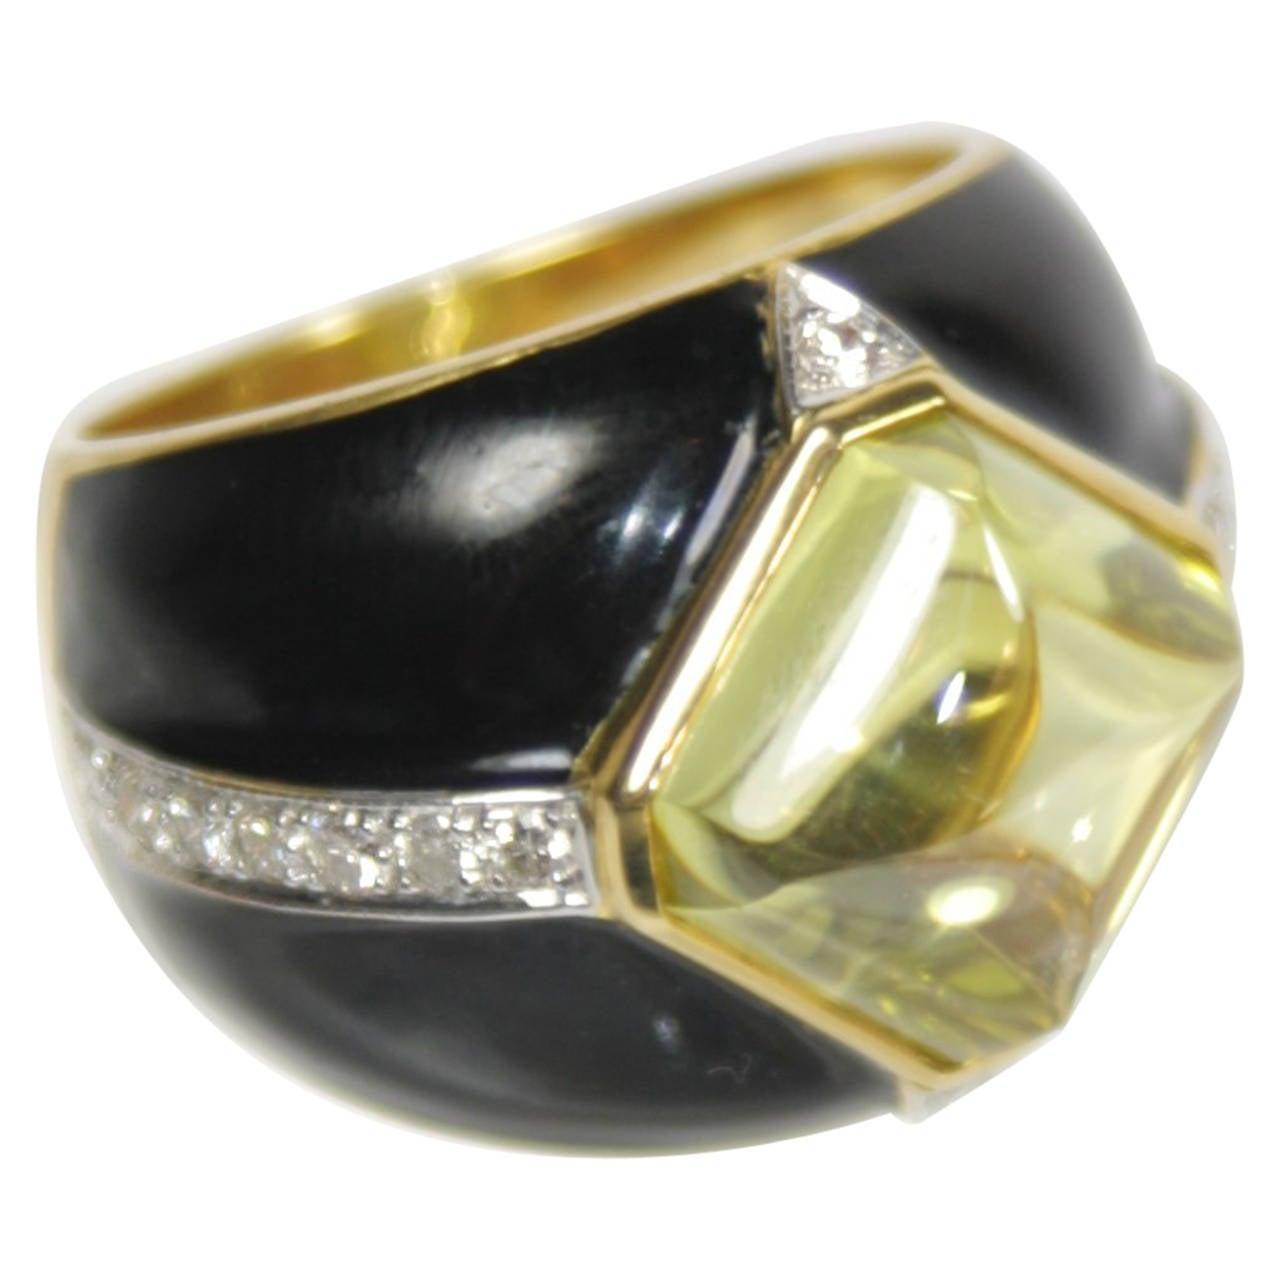 Black Enamel Yellow CZ Diamond Gold Ring For Sale at 1stdibs